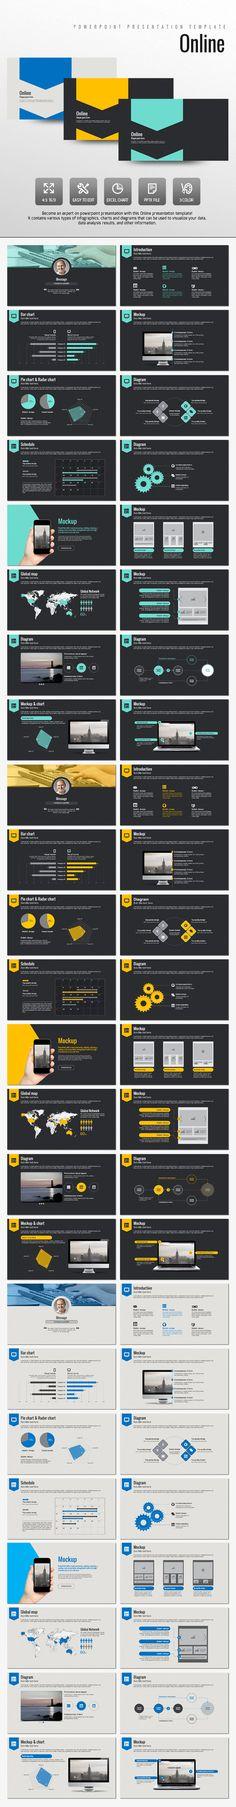 Online PowerPoint Presentation Template #design #slides Download: http://graphicriver.net/item/online/14000926?ref=ksioks